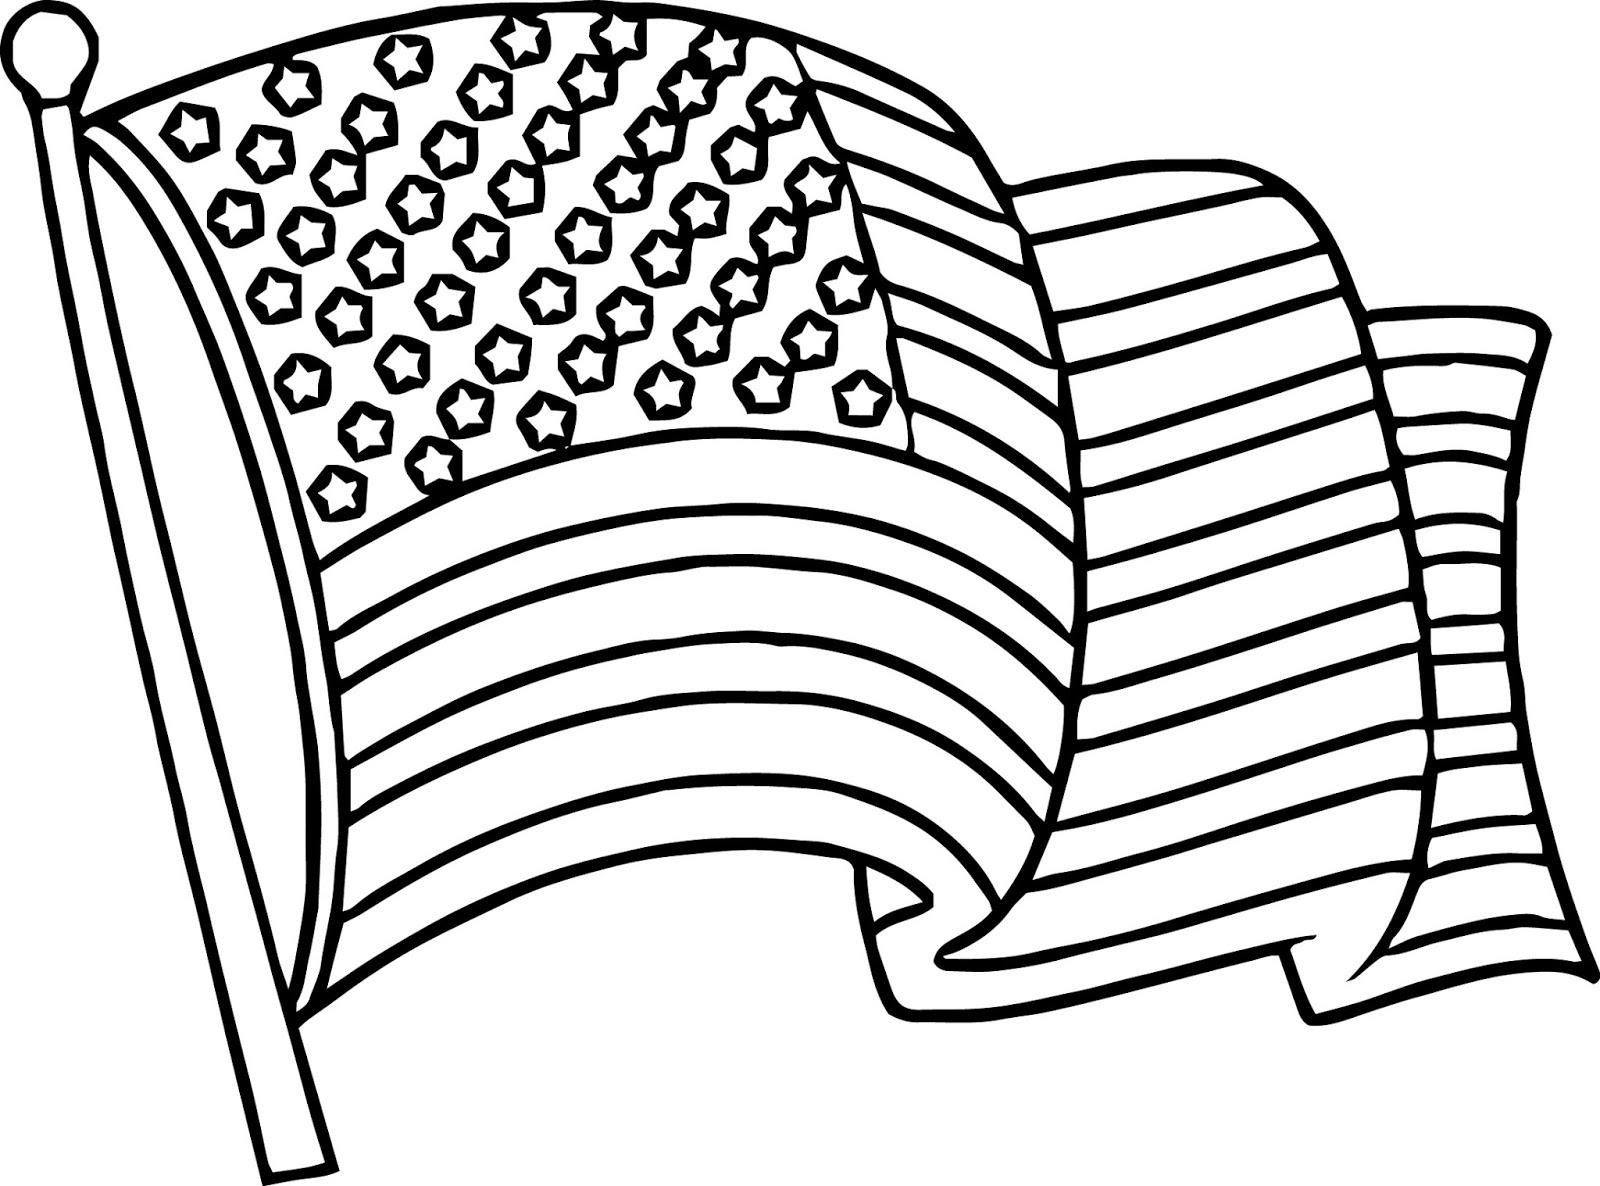 1600x1186 Edge Symbols Of The Usa Coloring Pages Arizona